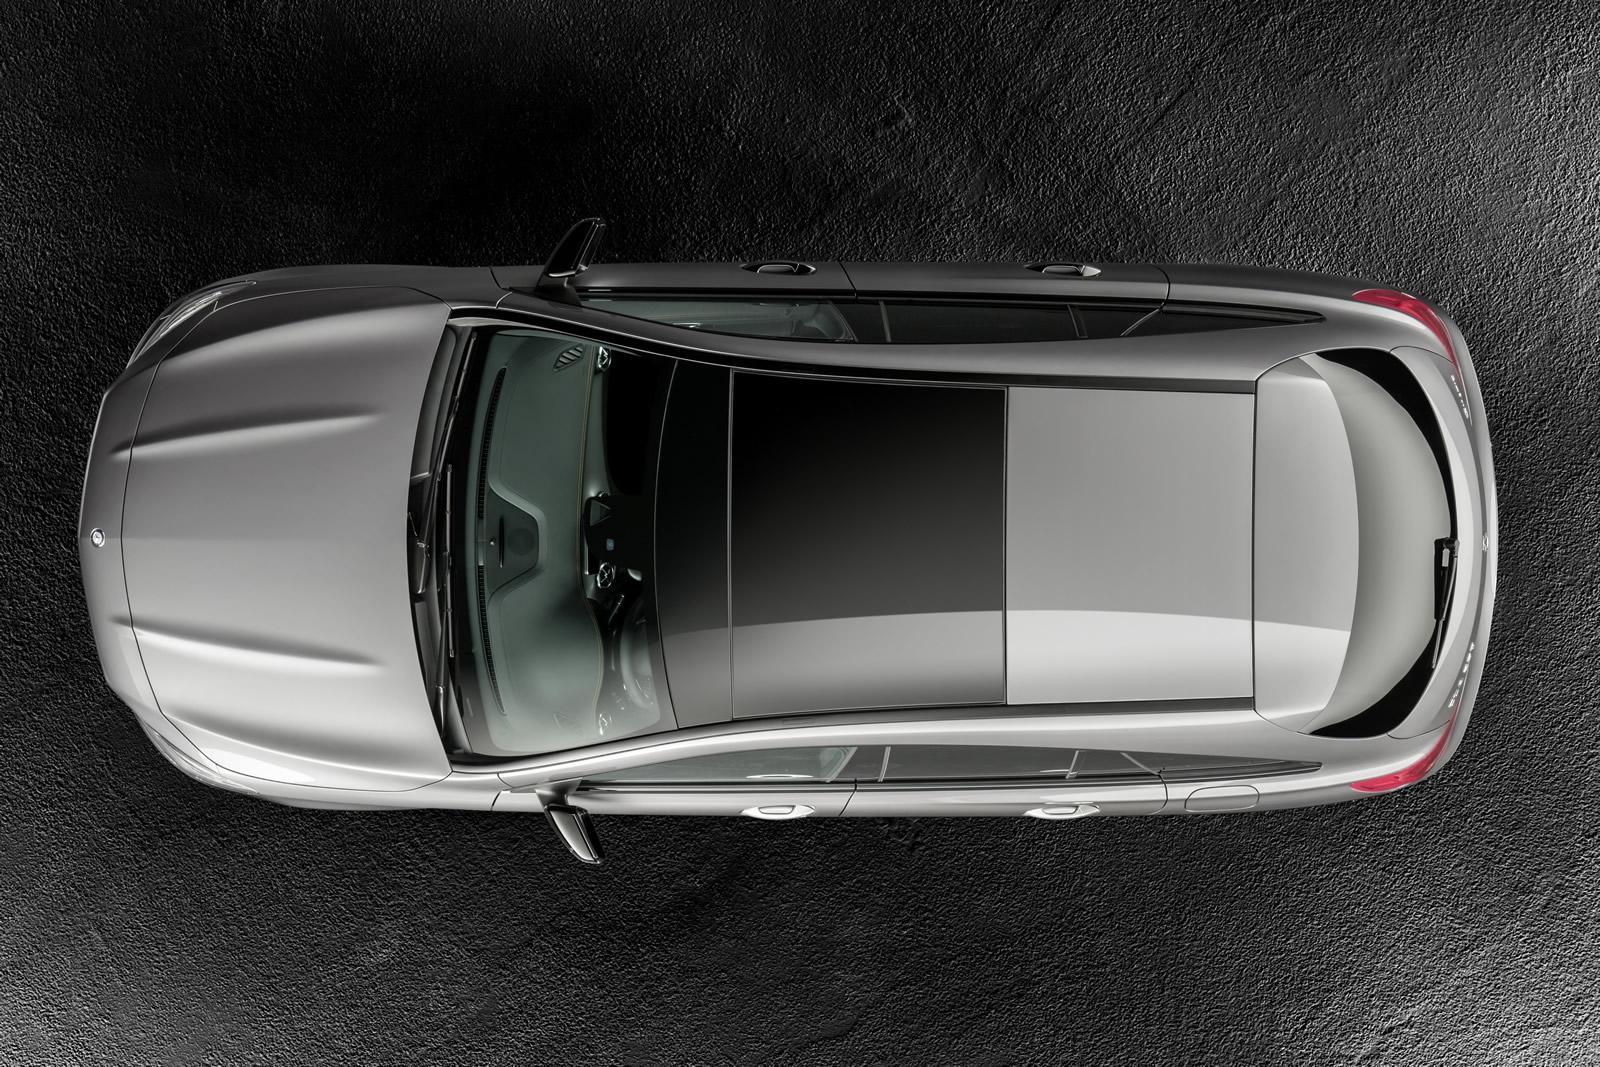 Mercedes CLA Shooting Brake top